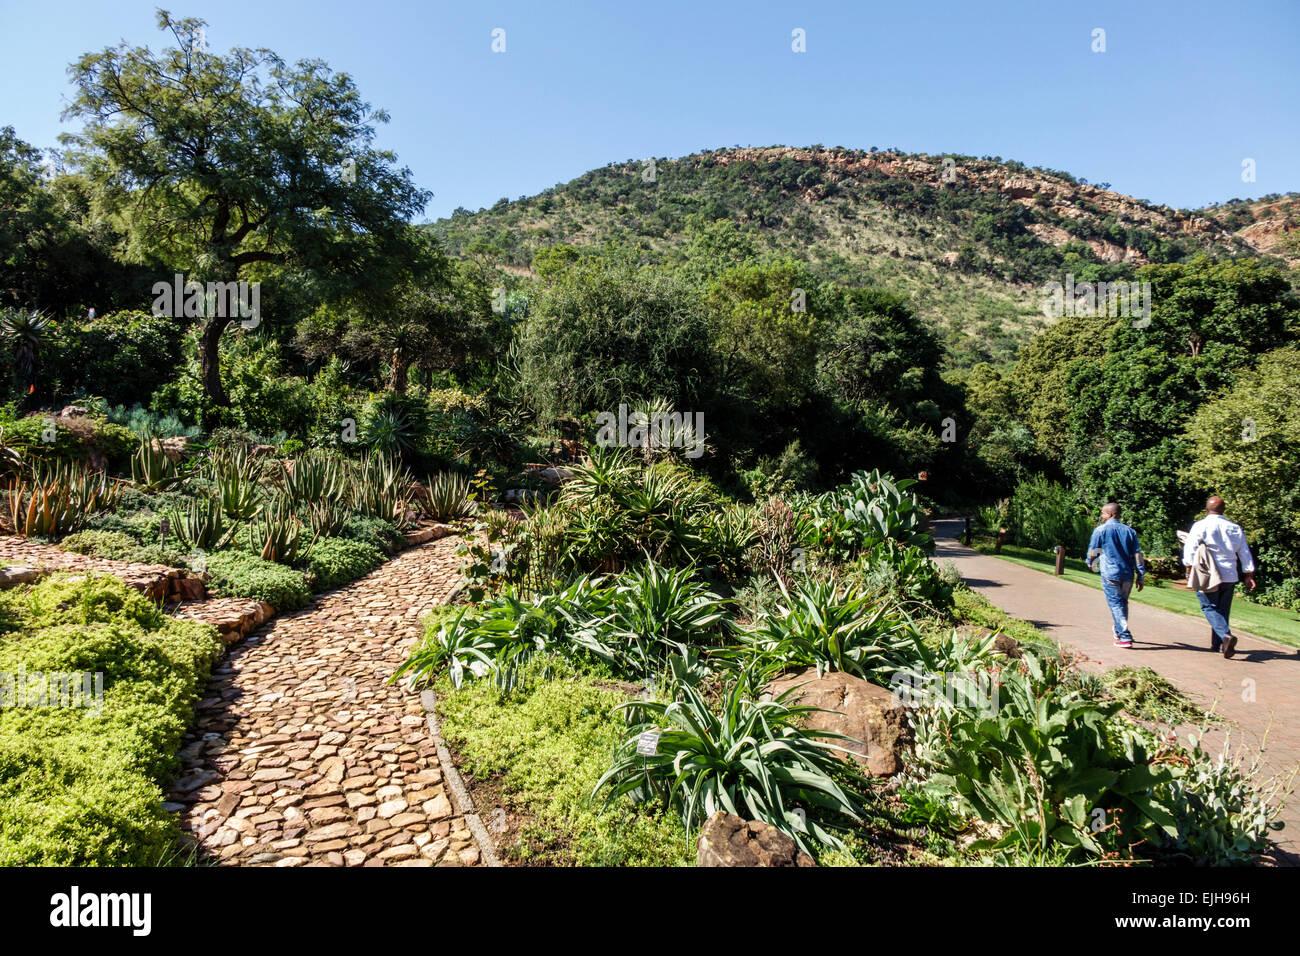 Johannesburg Sudafrica African Roodepoort Walter Sisulu Giardino Botanico nazionale geologico Witwatersrand man Immagini Stock